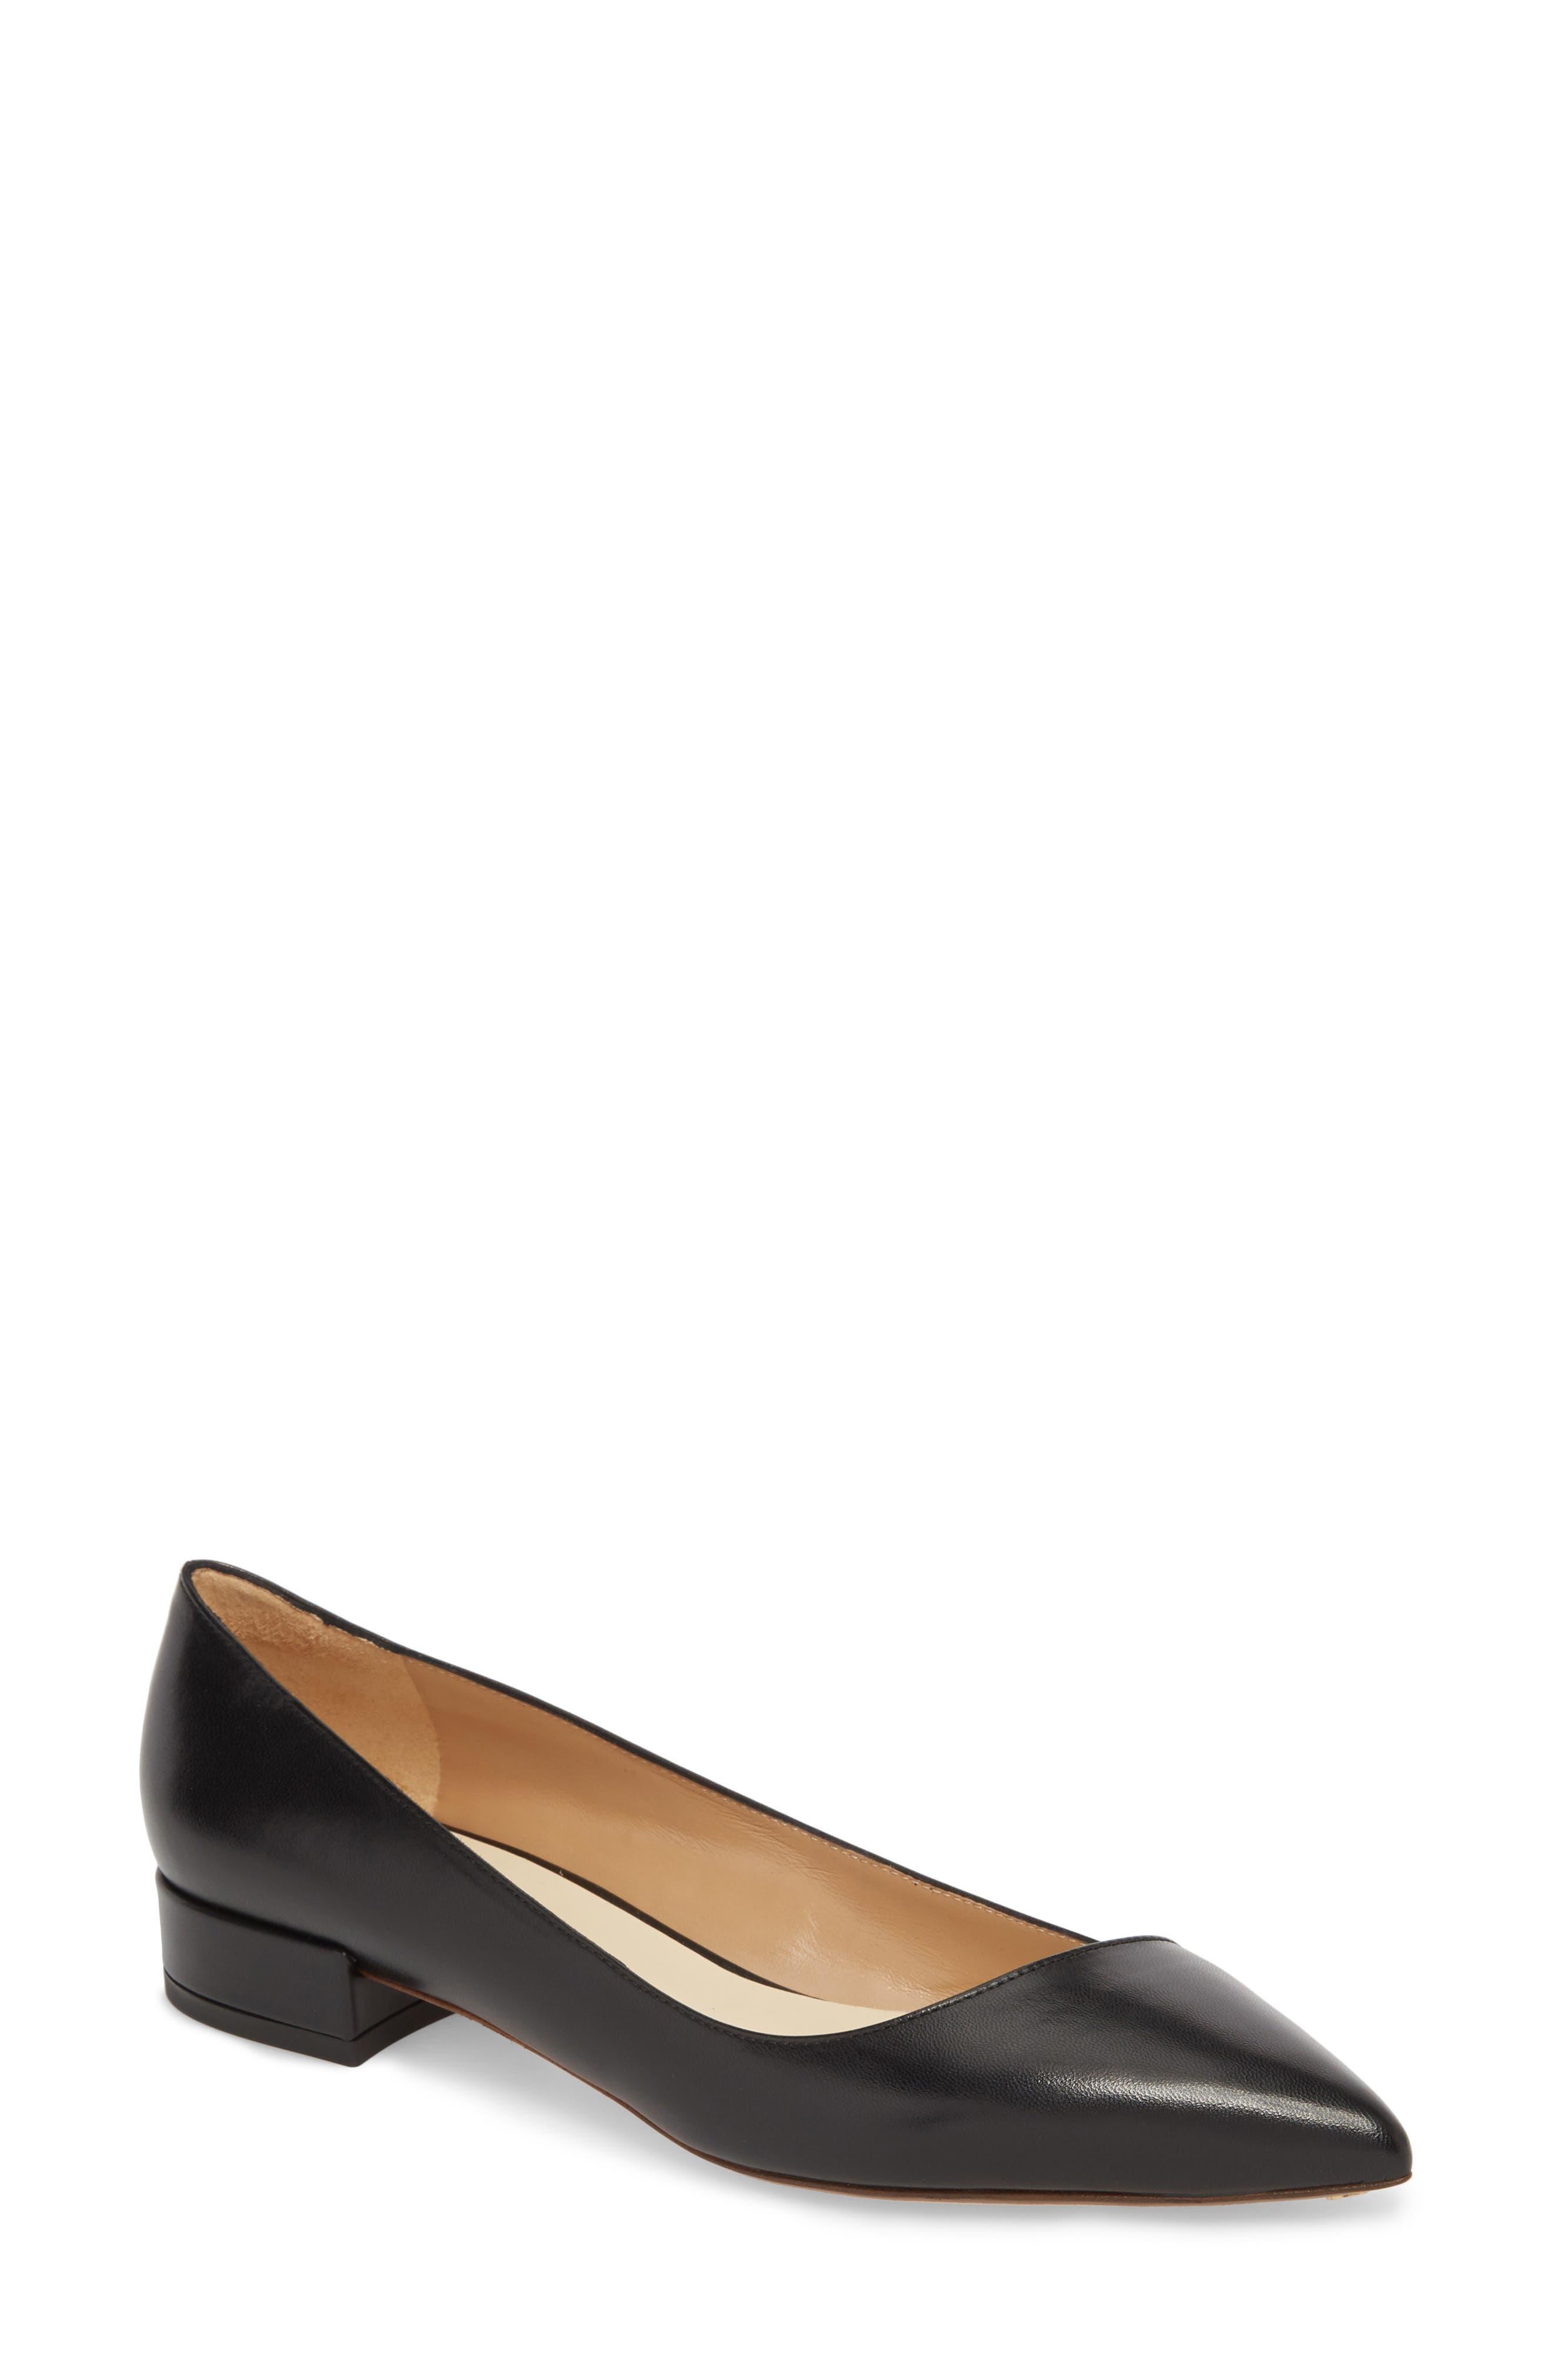 FRANCESCO RUSSO Asymmetric Pointy Toe Flat, Main, color, BLACK